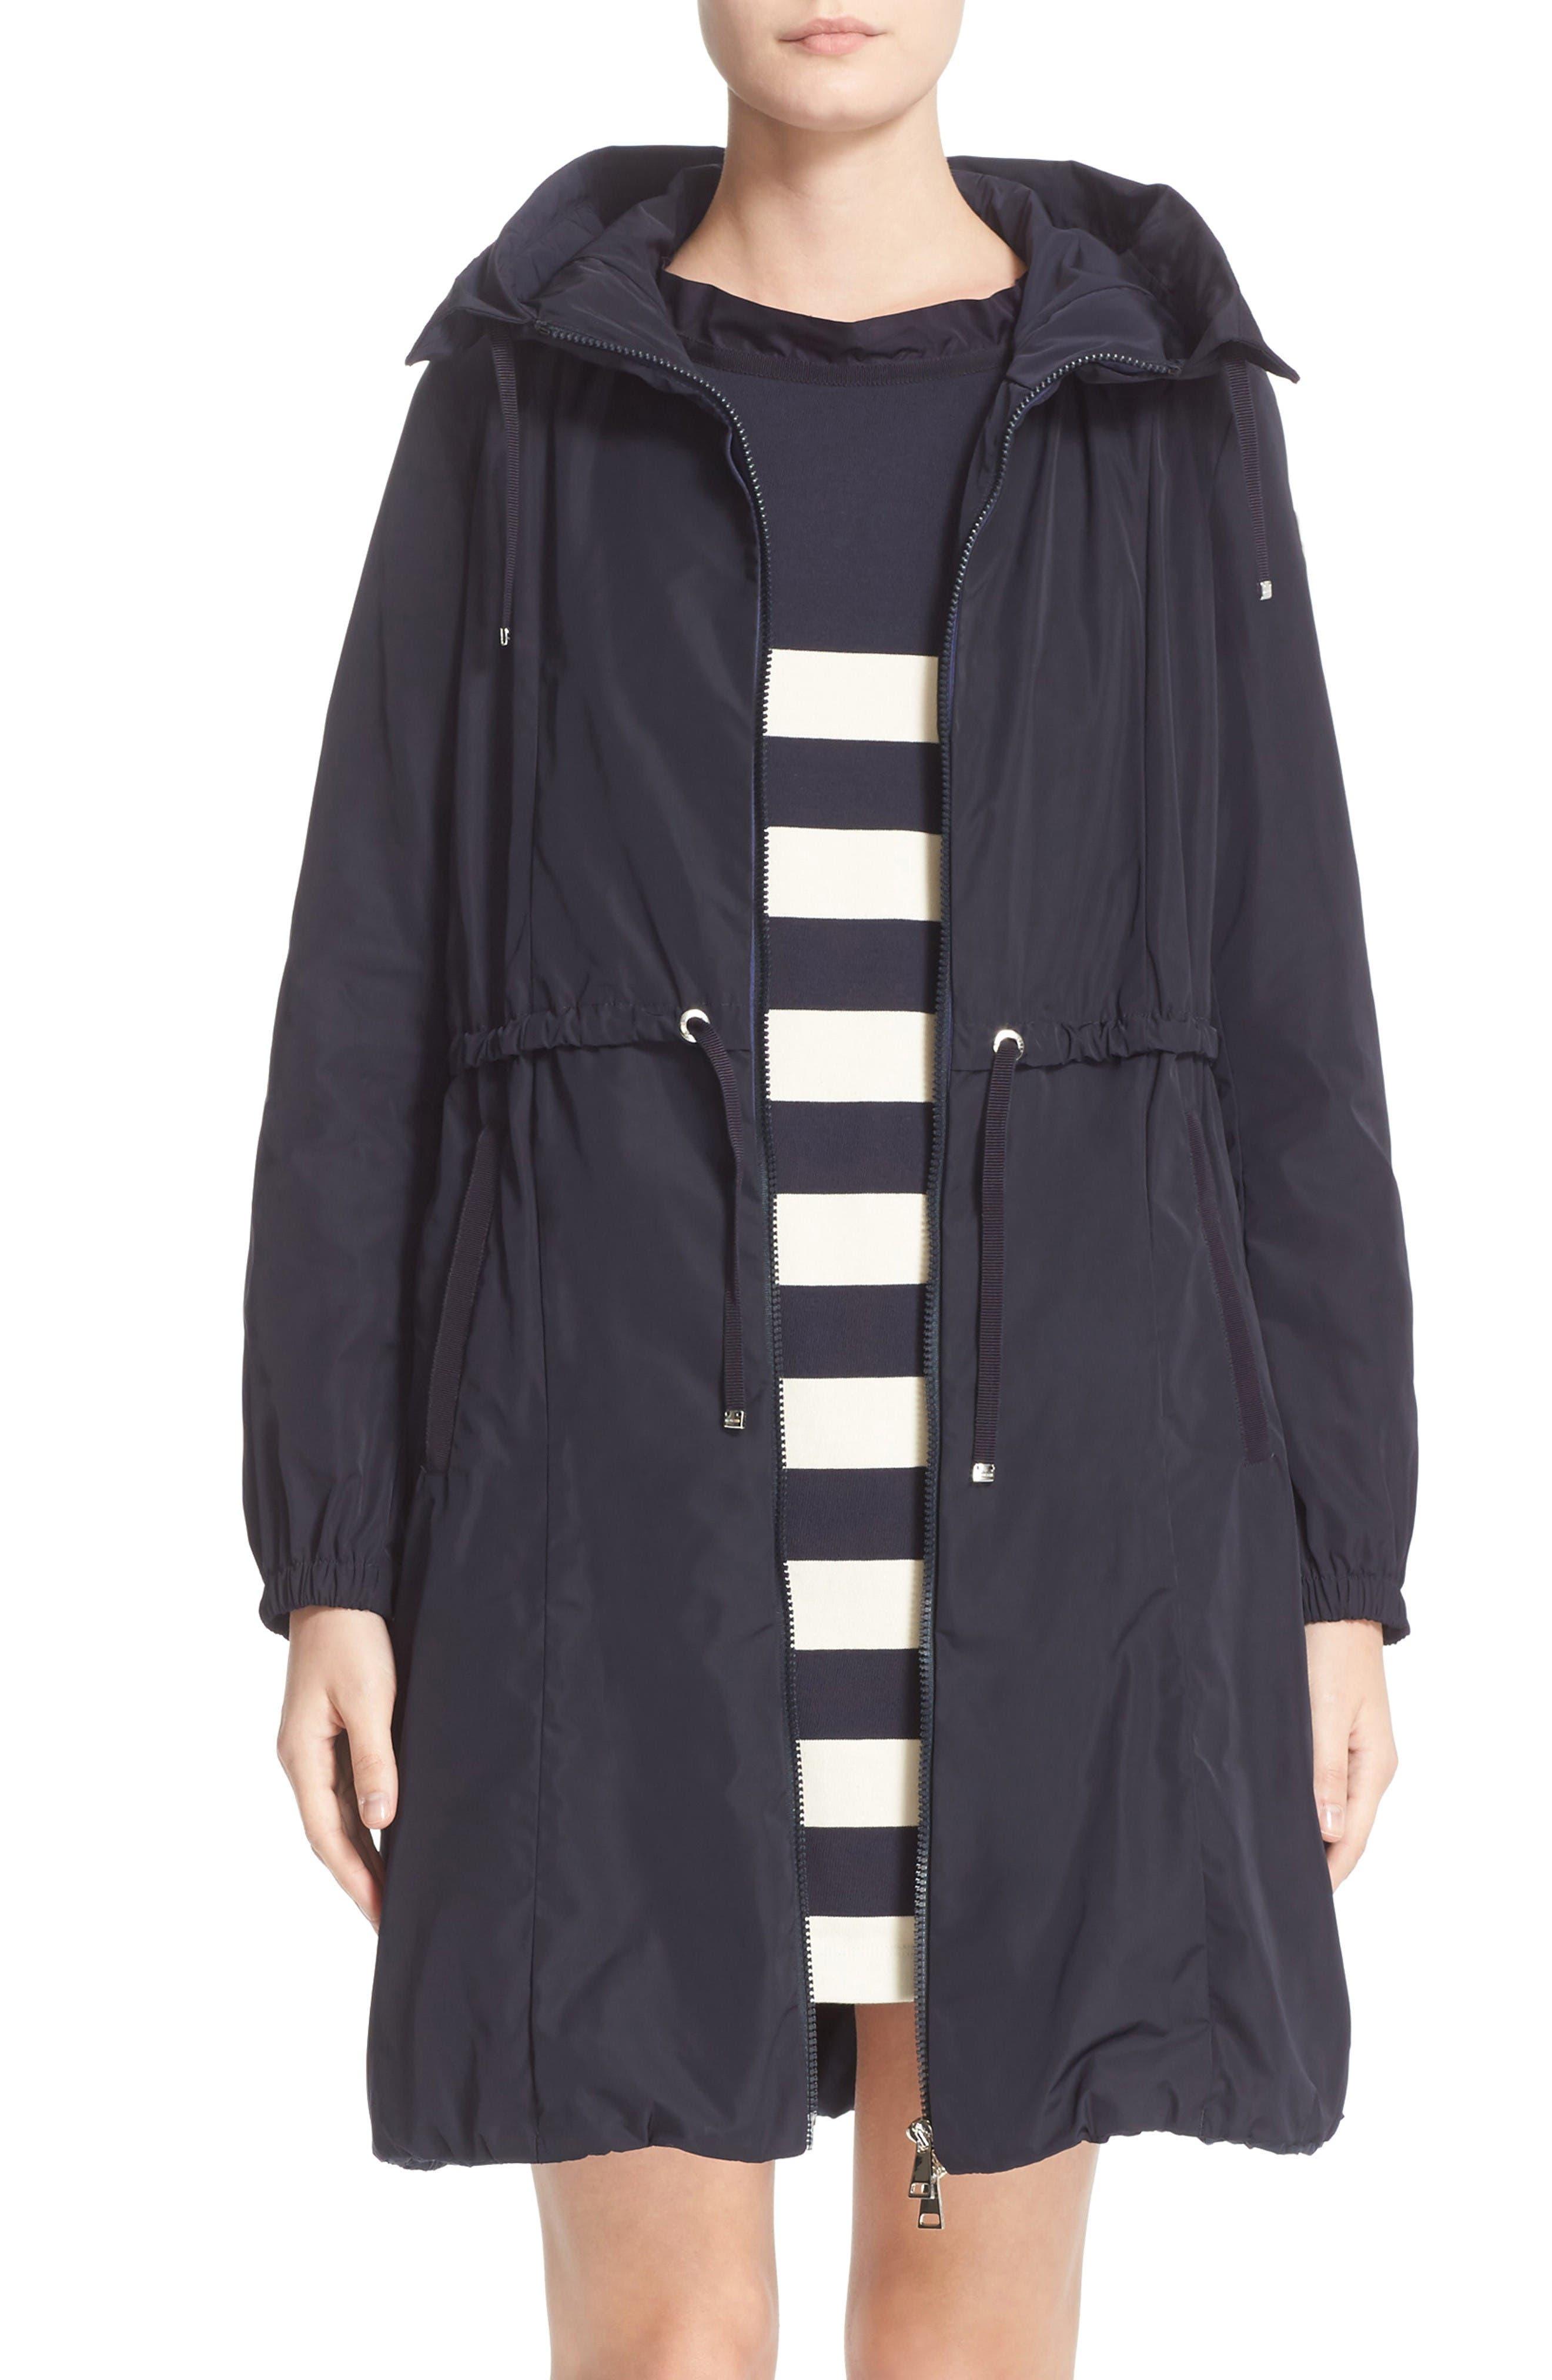 Moncler Tuile Water Resistant Long Raincoat